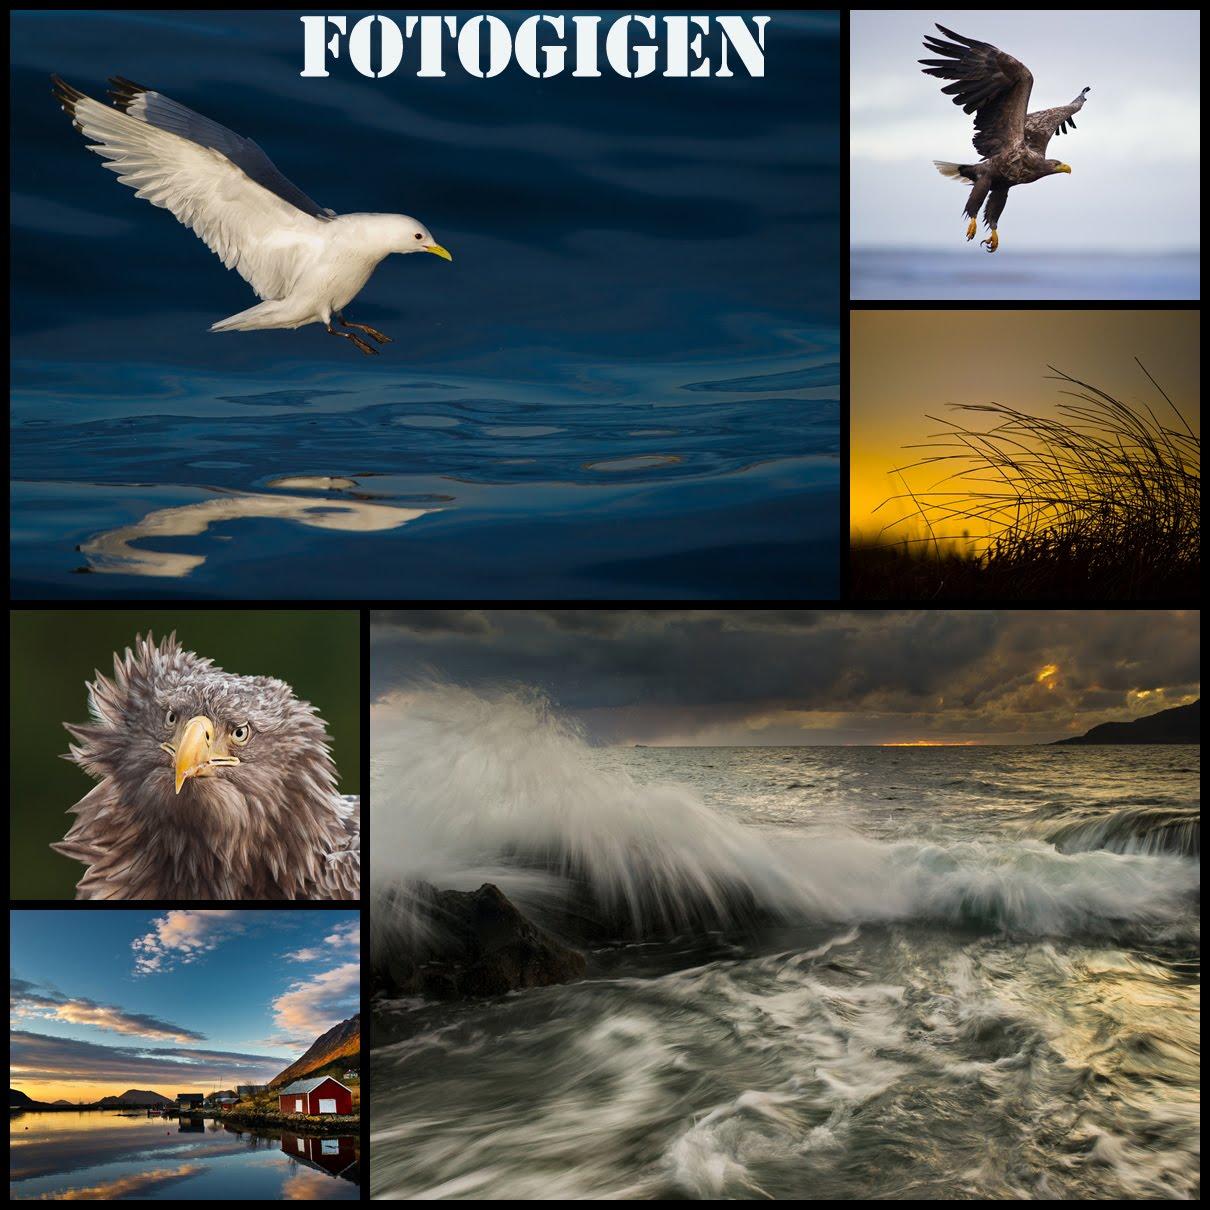 FOTOGIGEN.